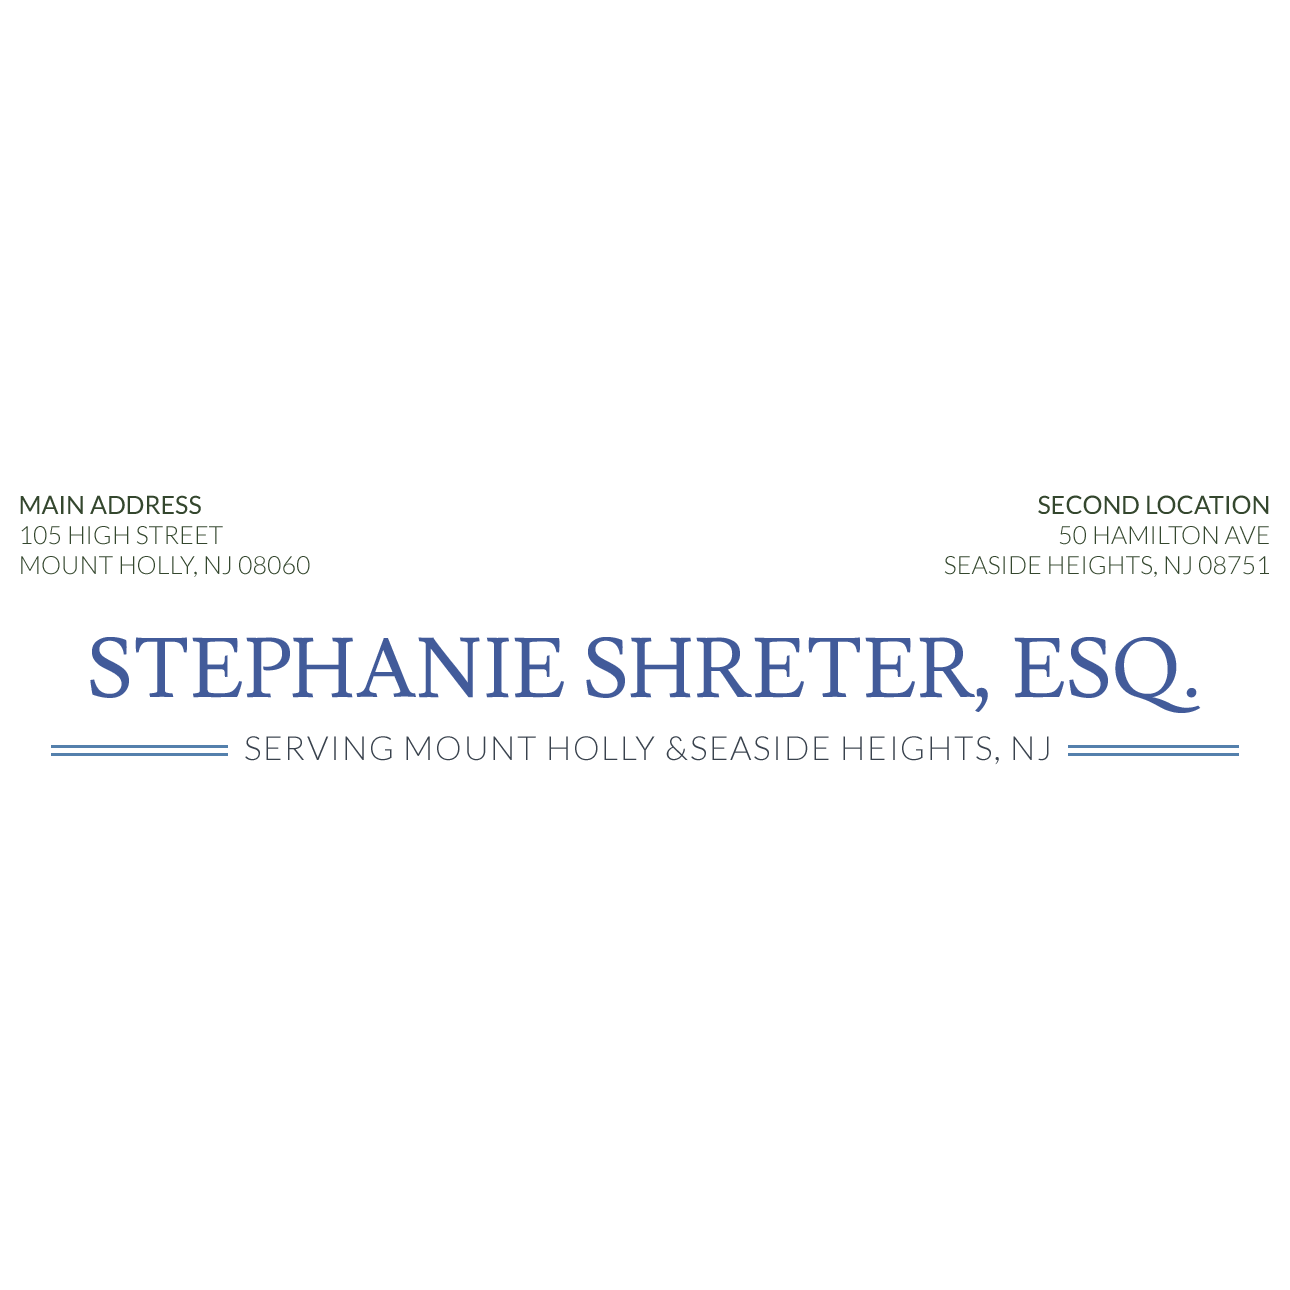 Stephanie Shreter, Esq